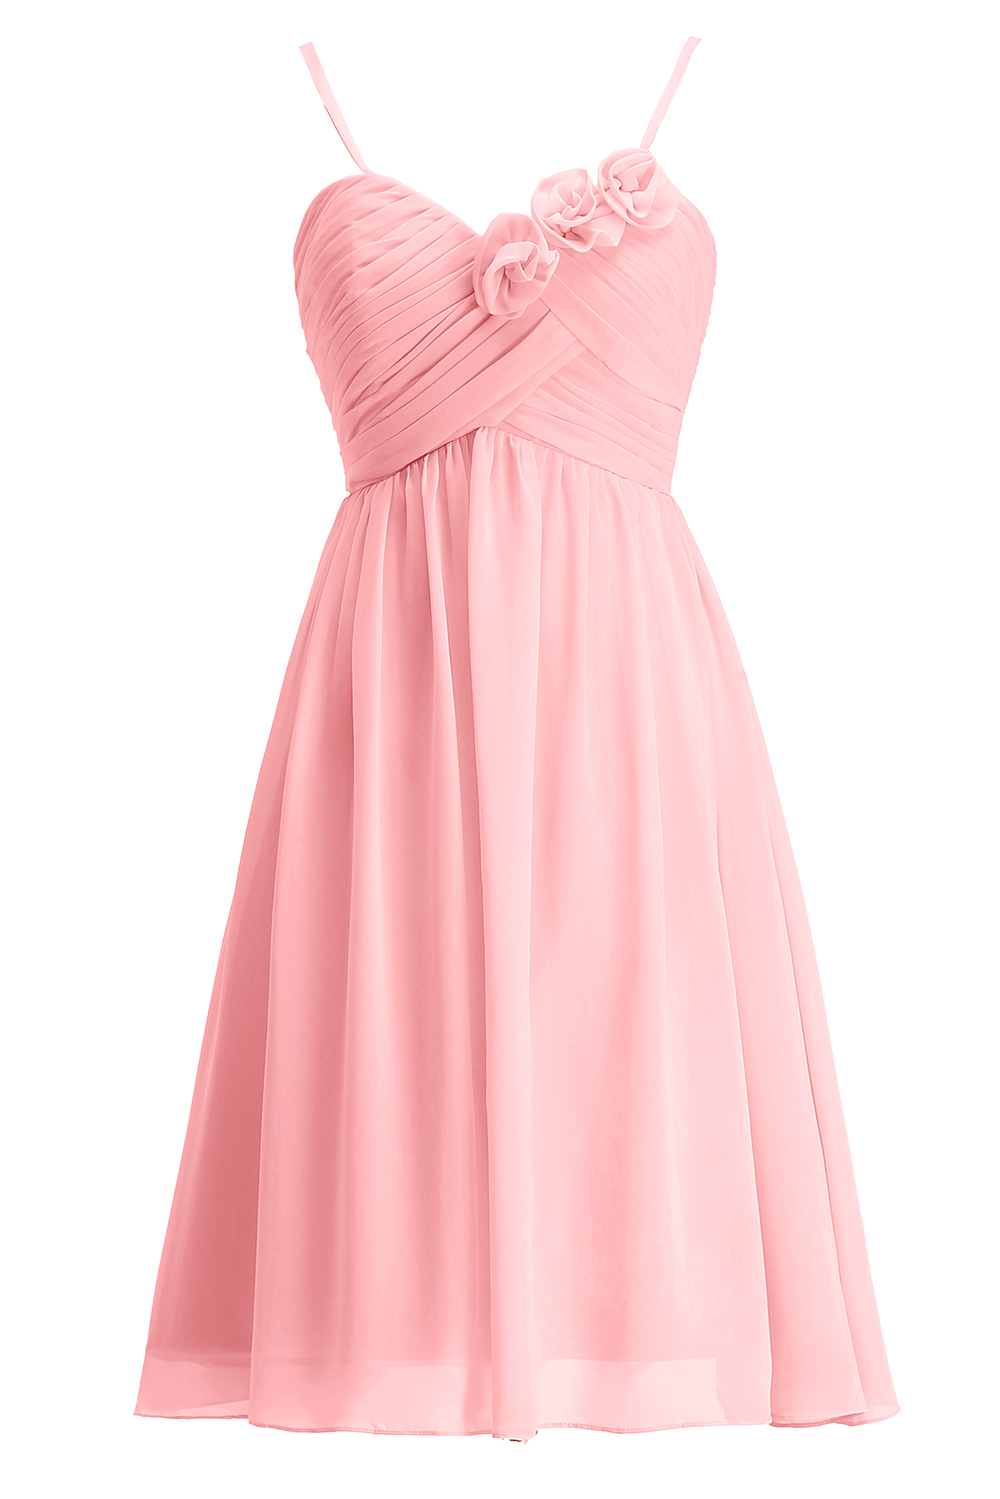 ynqnfs New Holy Communion Party Pink Mint Green Empire Waist Short Bridesmaid Dress Cheap